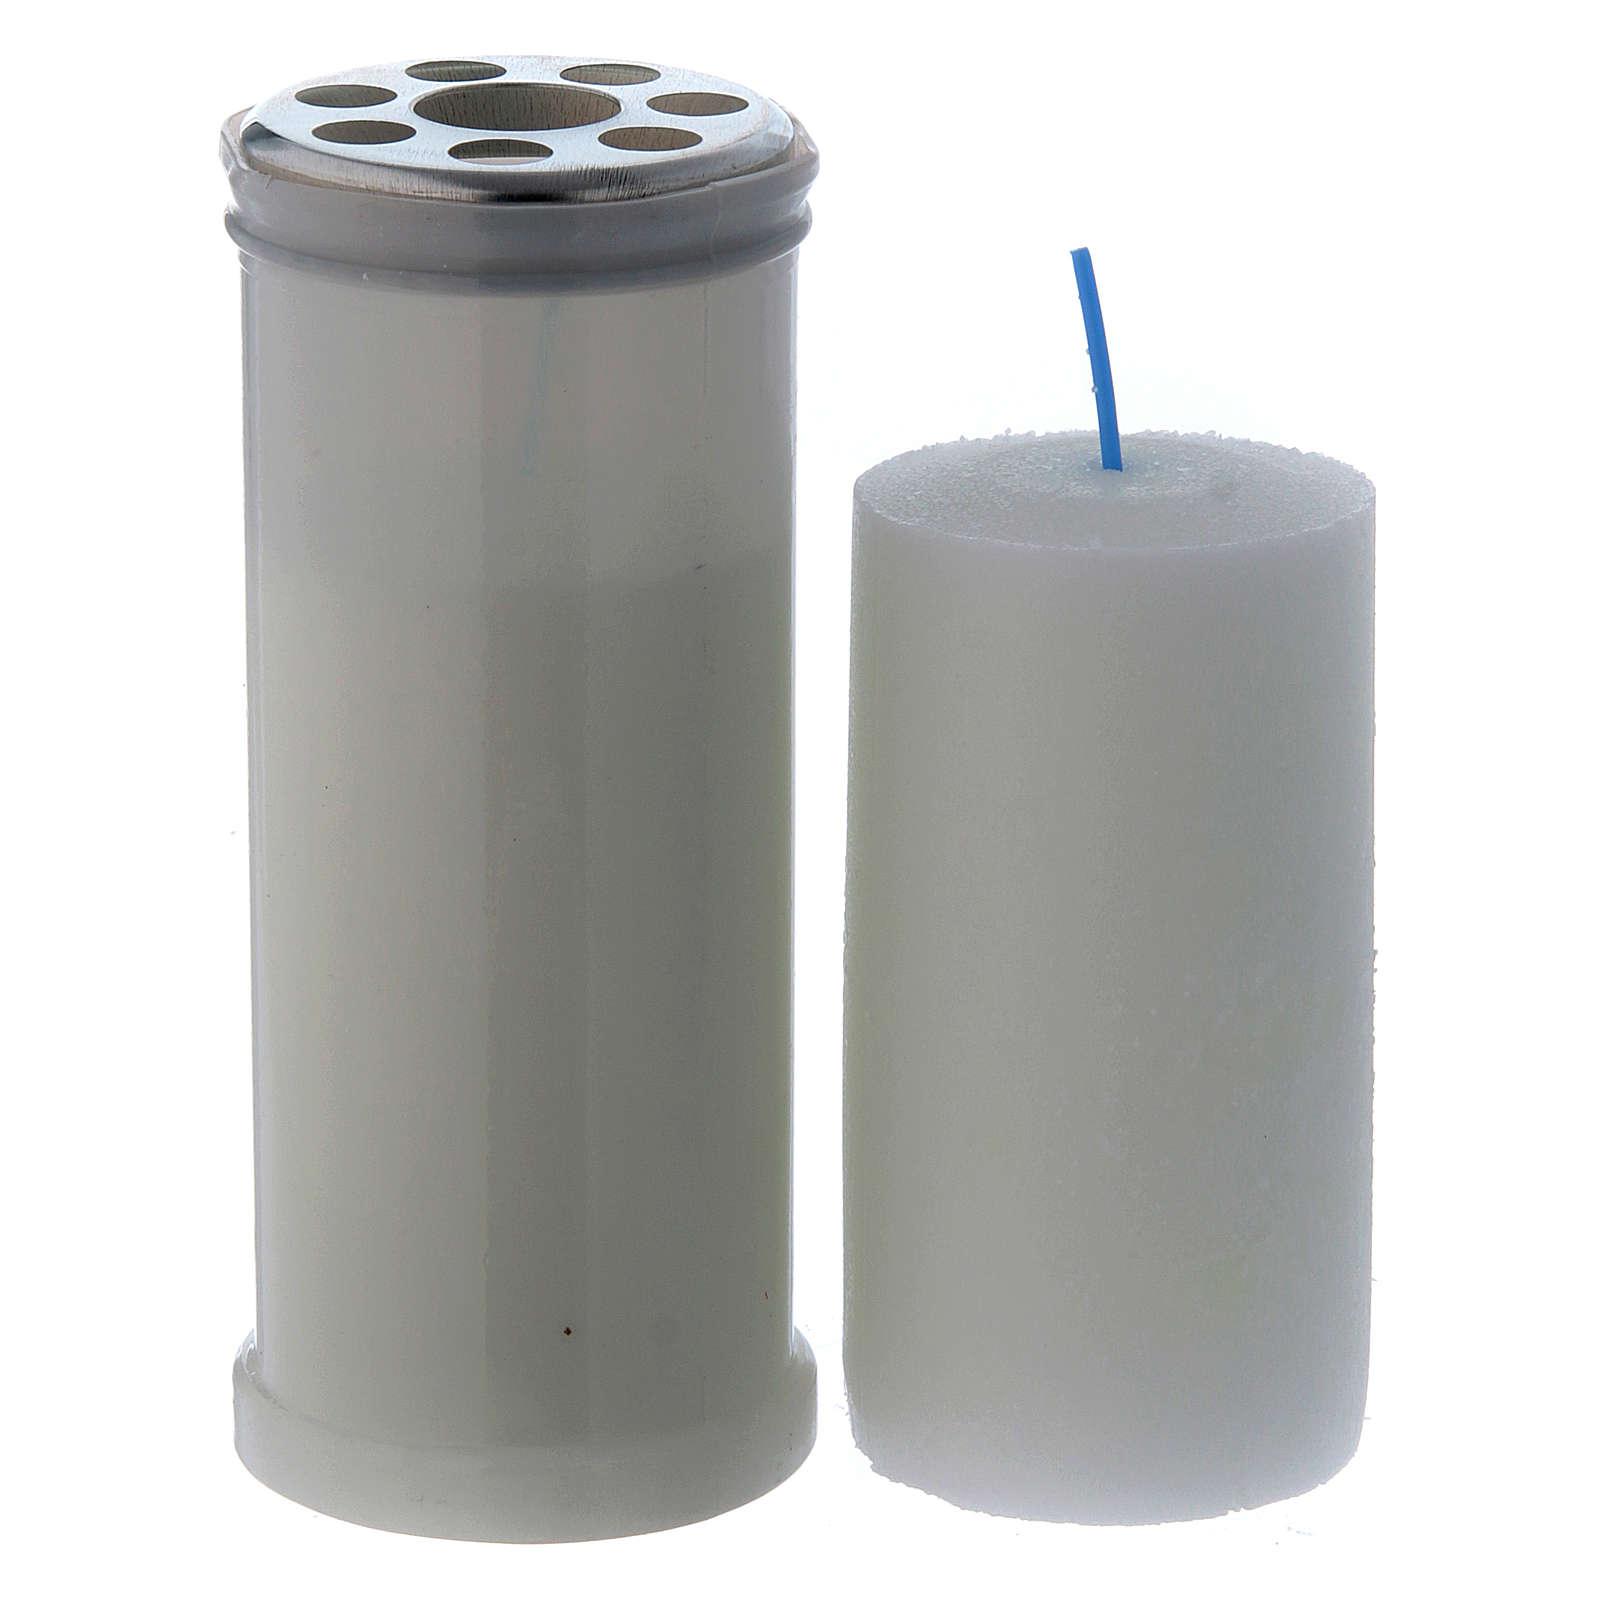 Lampe votive blanche T40 avec cire blanche 3